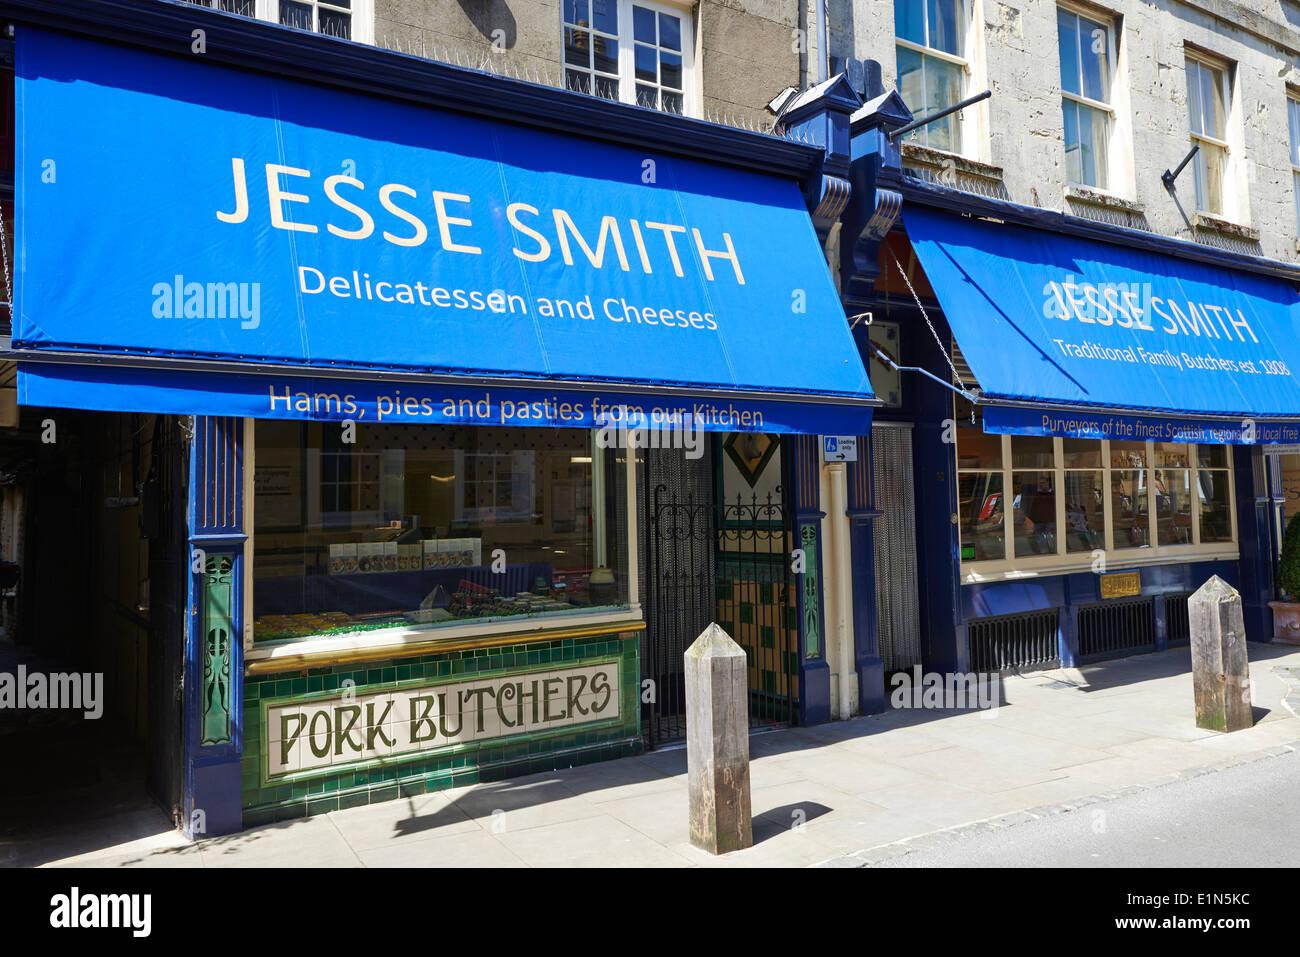 Jesse Smith traditional butcher since 1808 Black Jack Street Cirencester Gloucestershire UK - Stock Image